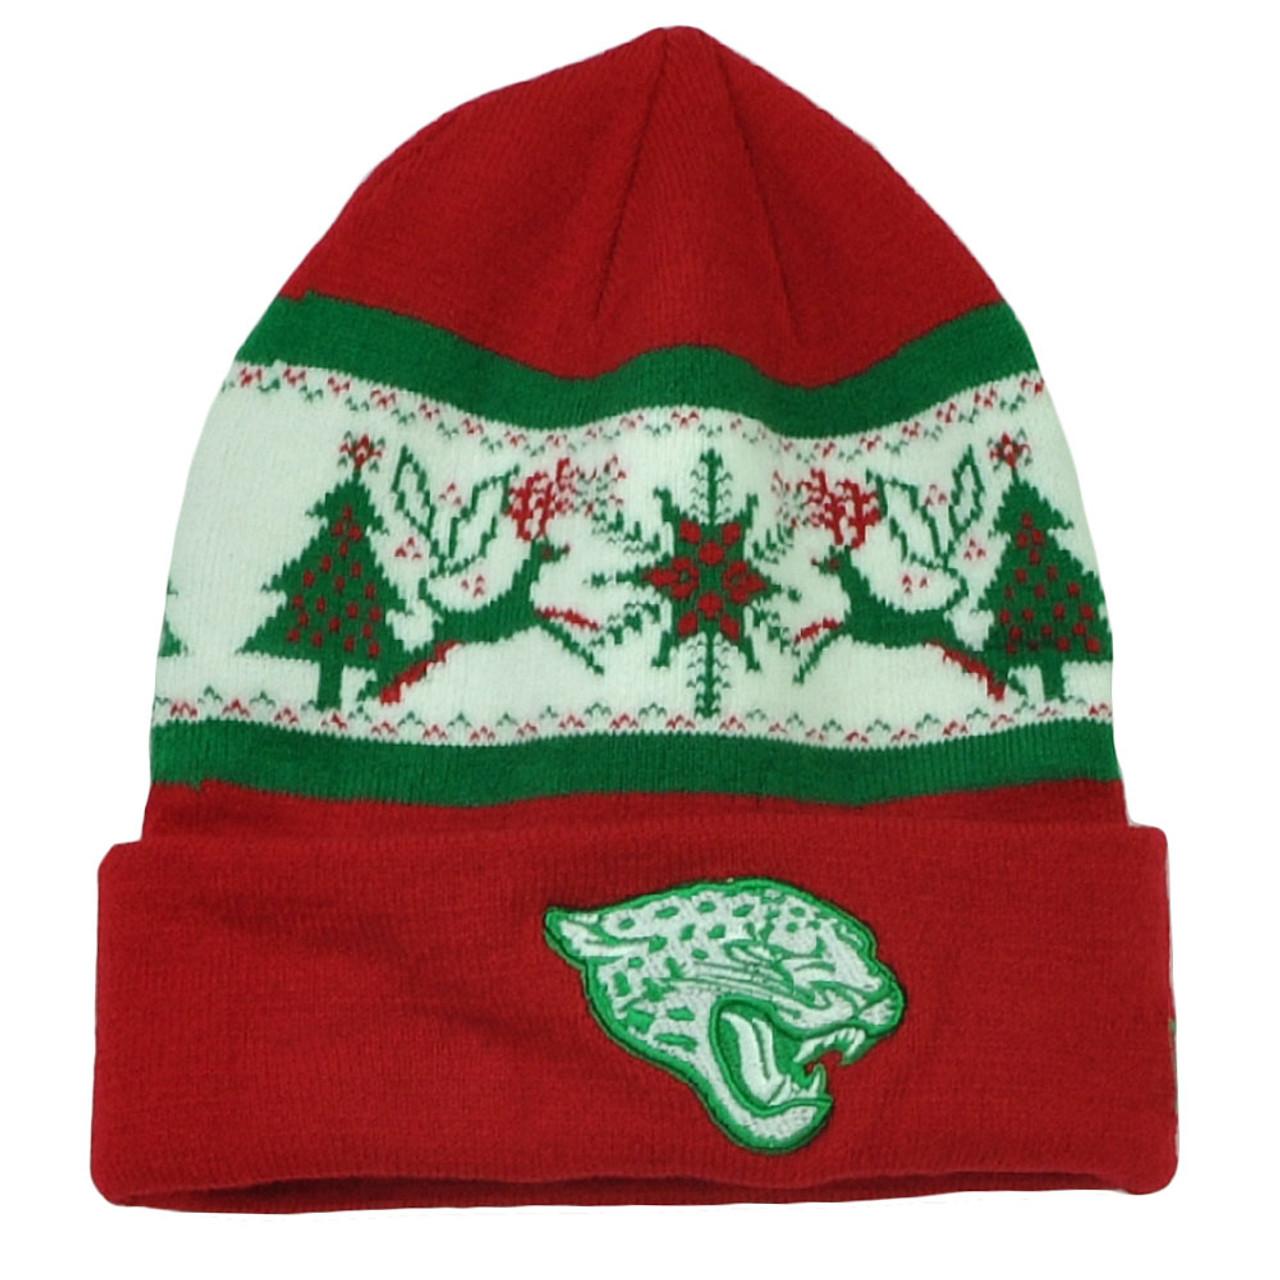 86a525d78a5d5d NFL New Era Fillz Jacksonville Jaguars Cuffed Knit Beanie Toque Christmas  Theme - Cap Store Online.com